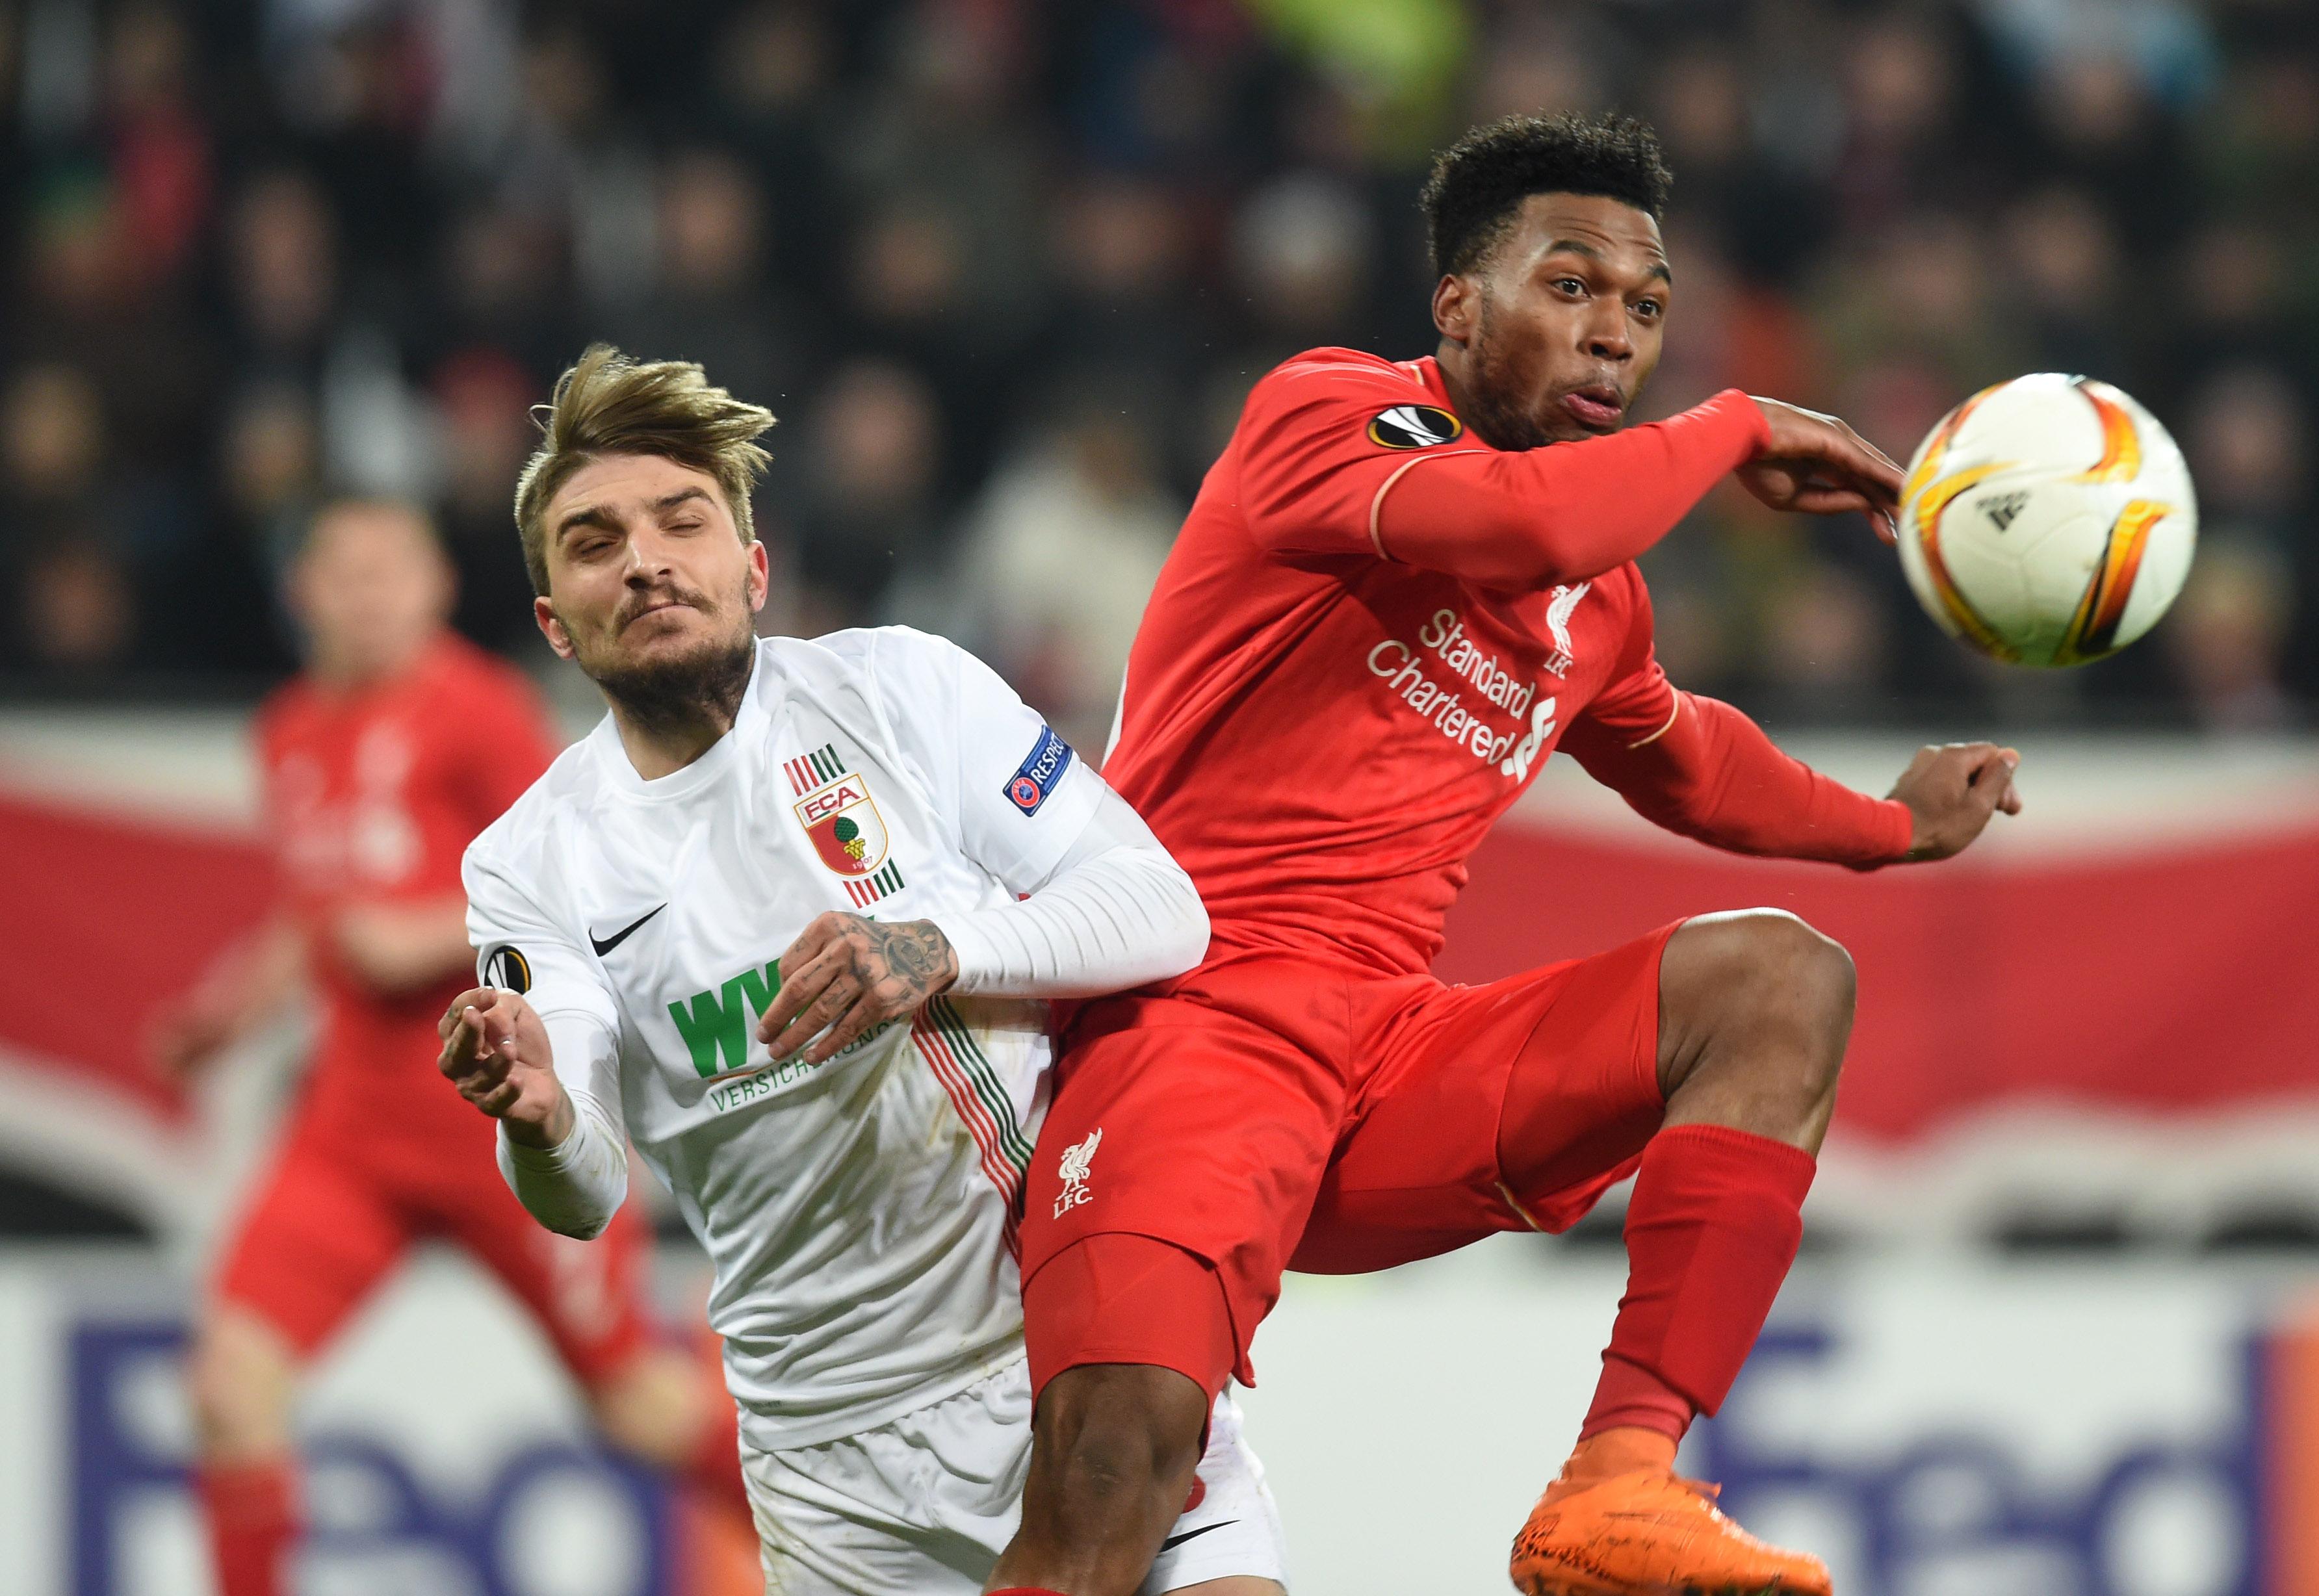 Augsburg Liverpool Live Stream